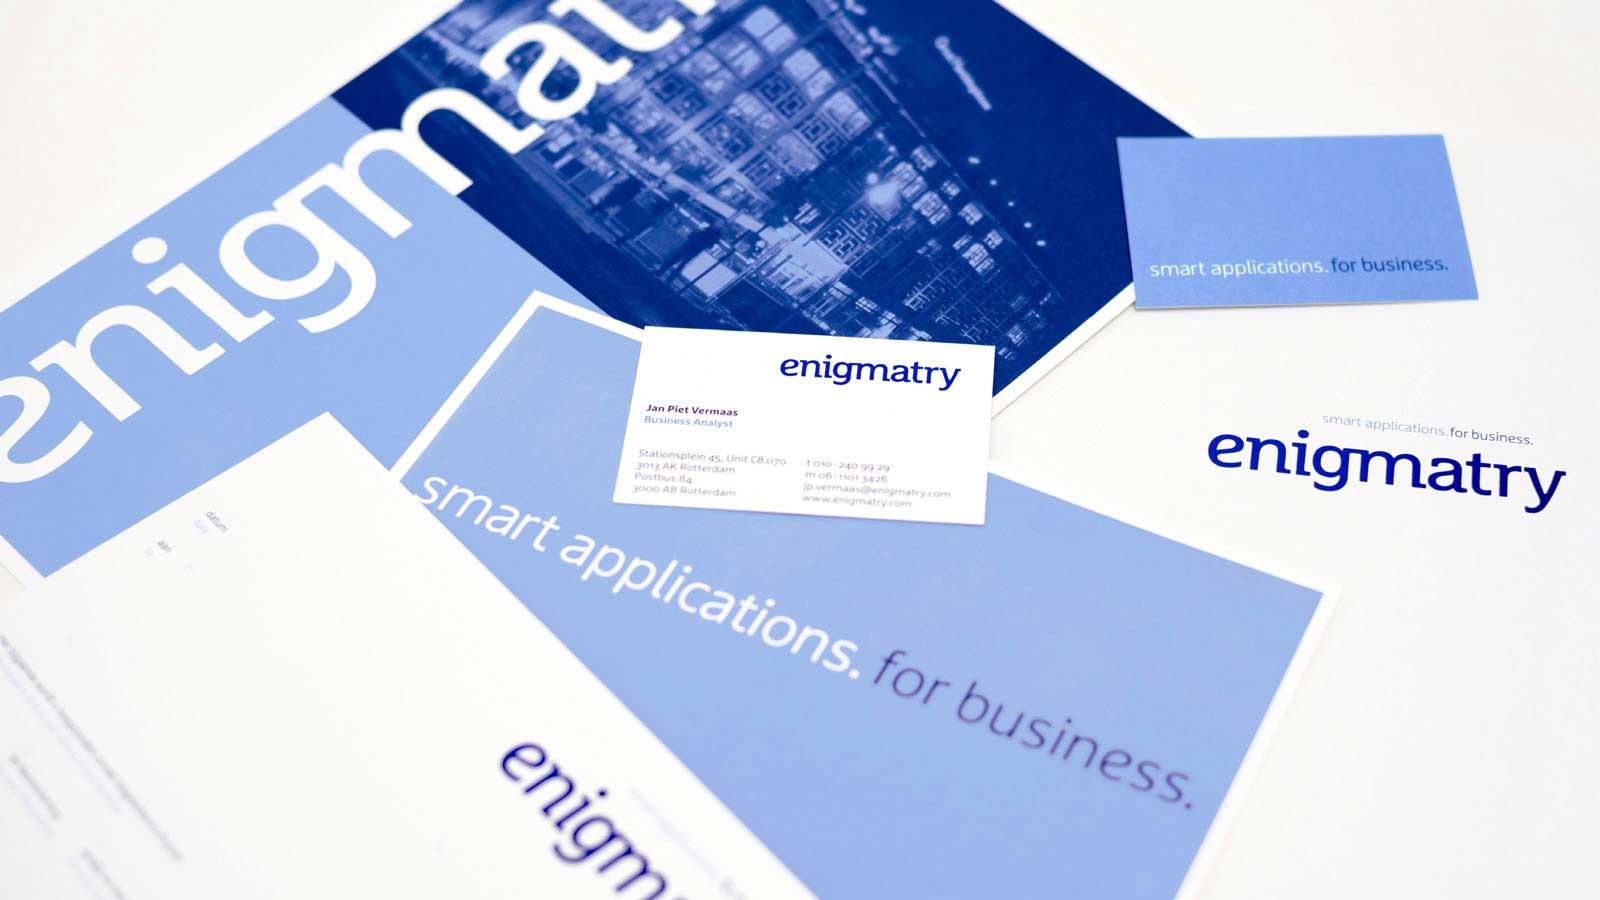 Merkdentiteit en branding enigmatry - ontwerpbureau diepzicht nijmegen